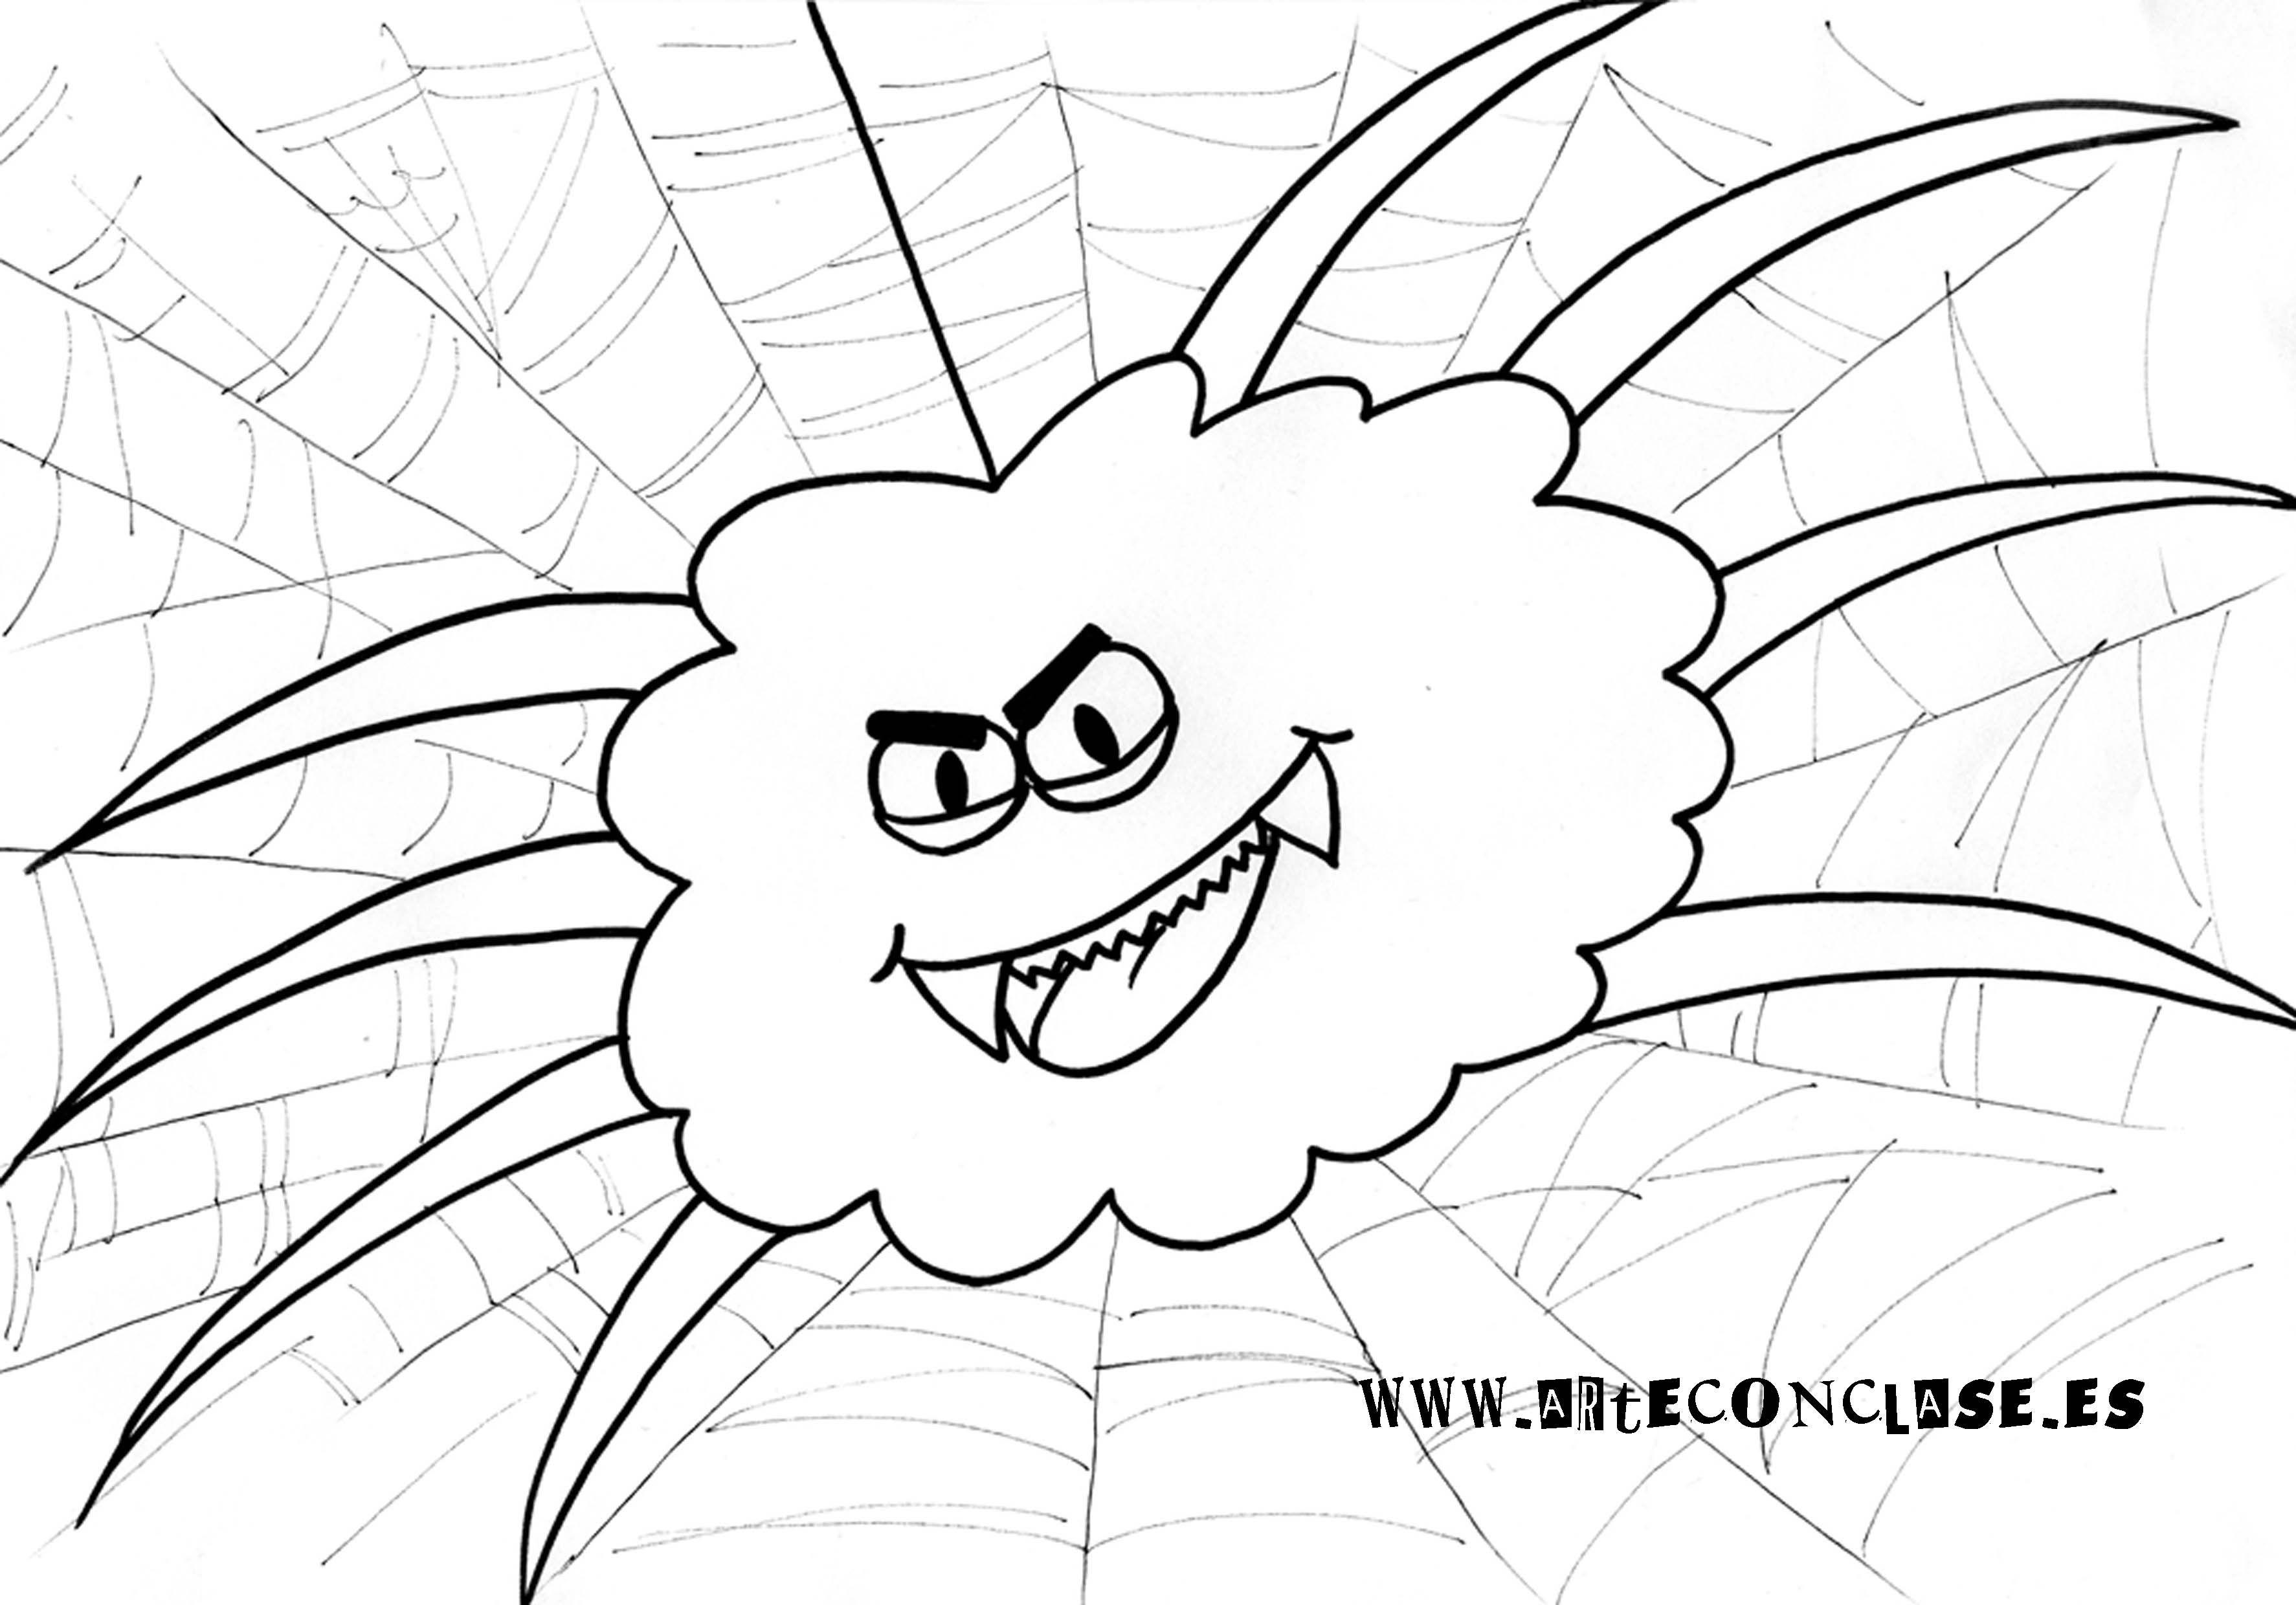 Arañas De Halloween Para Colorear: Dibujo De Una Araña Para Colorear En Halloween